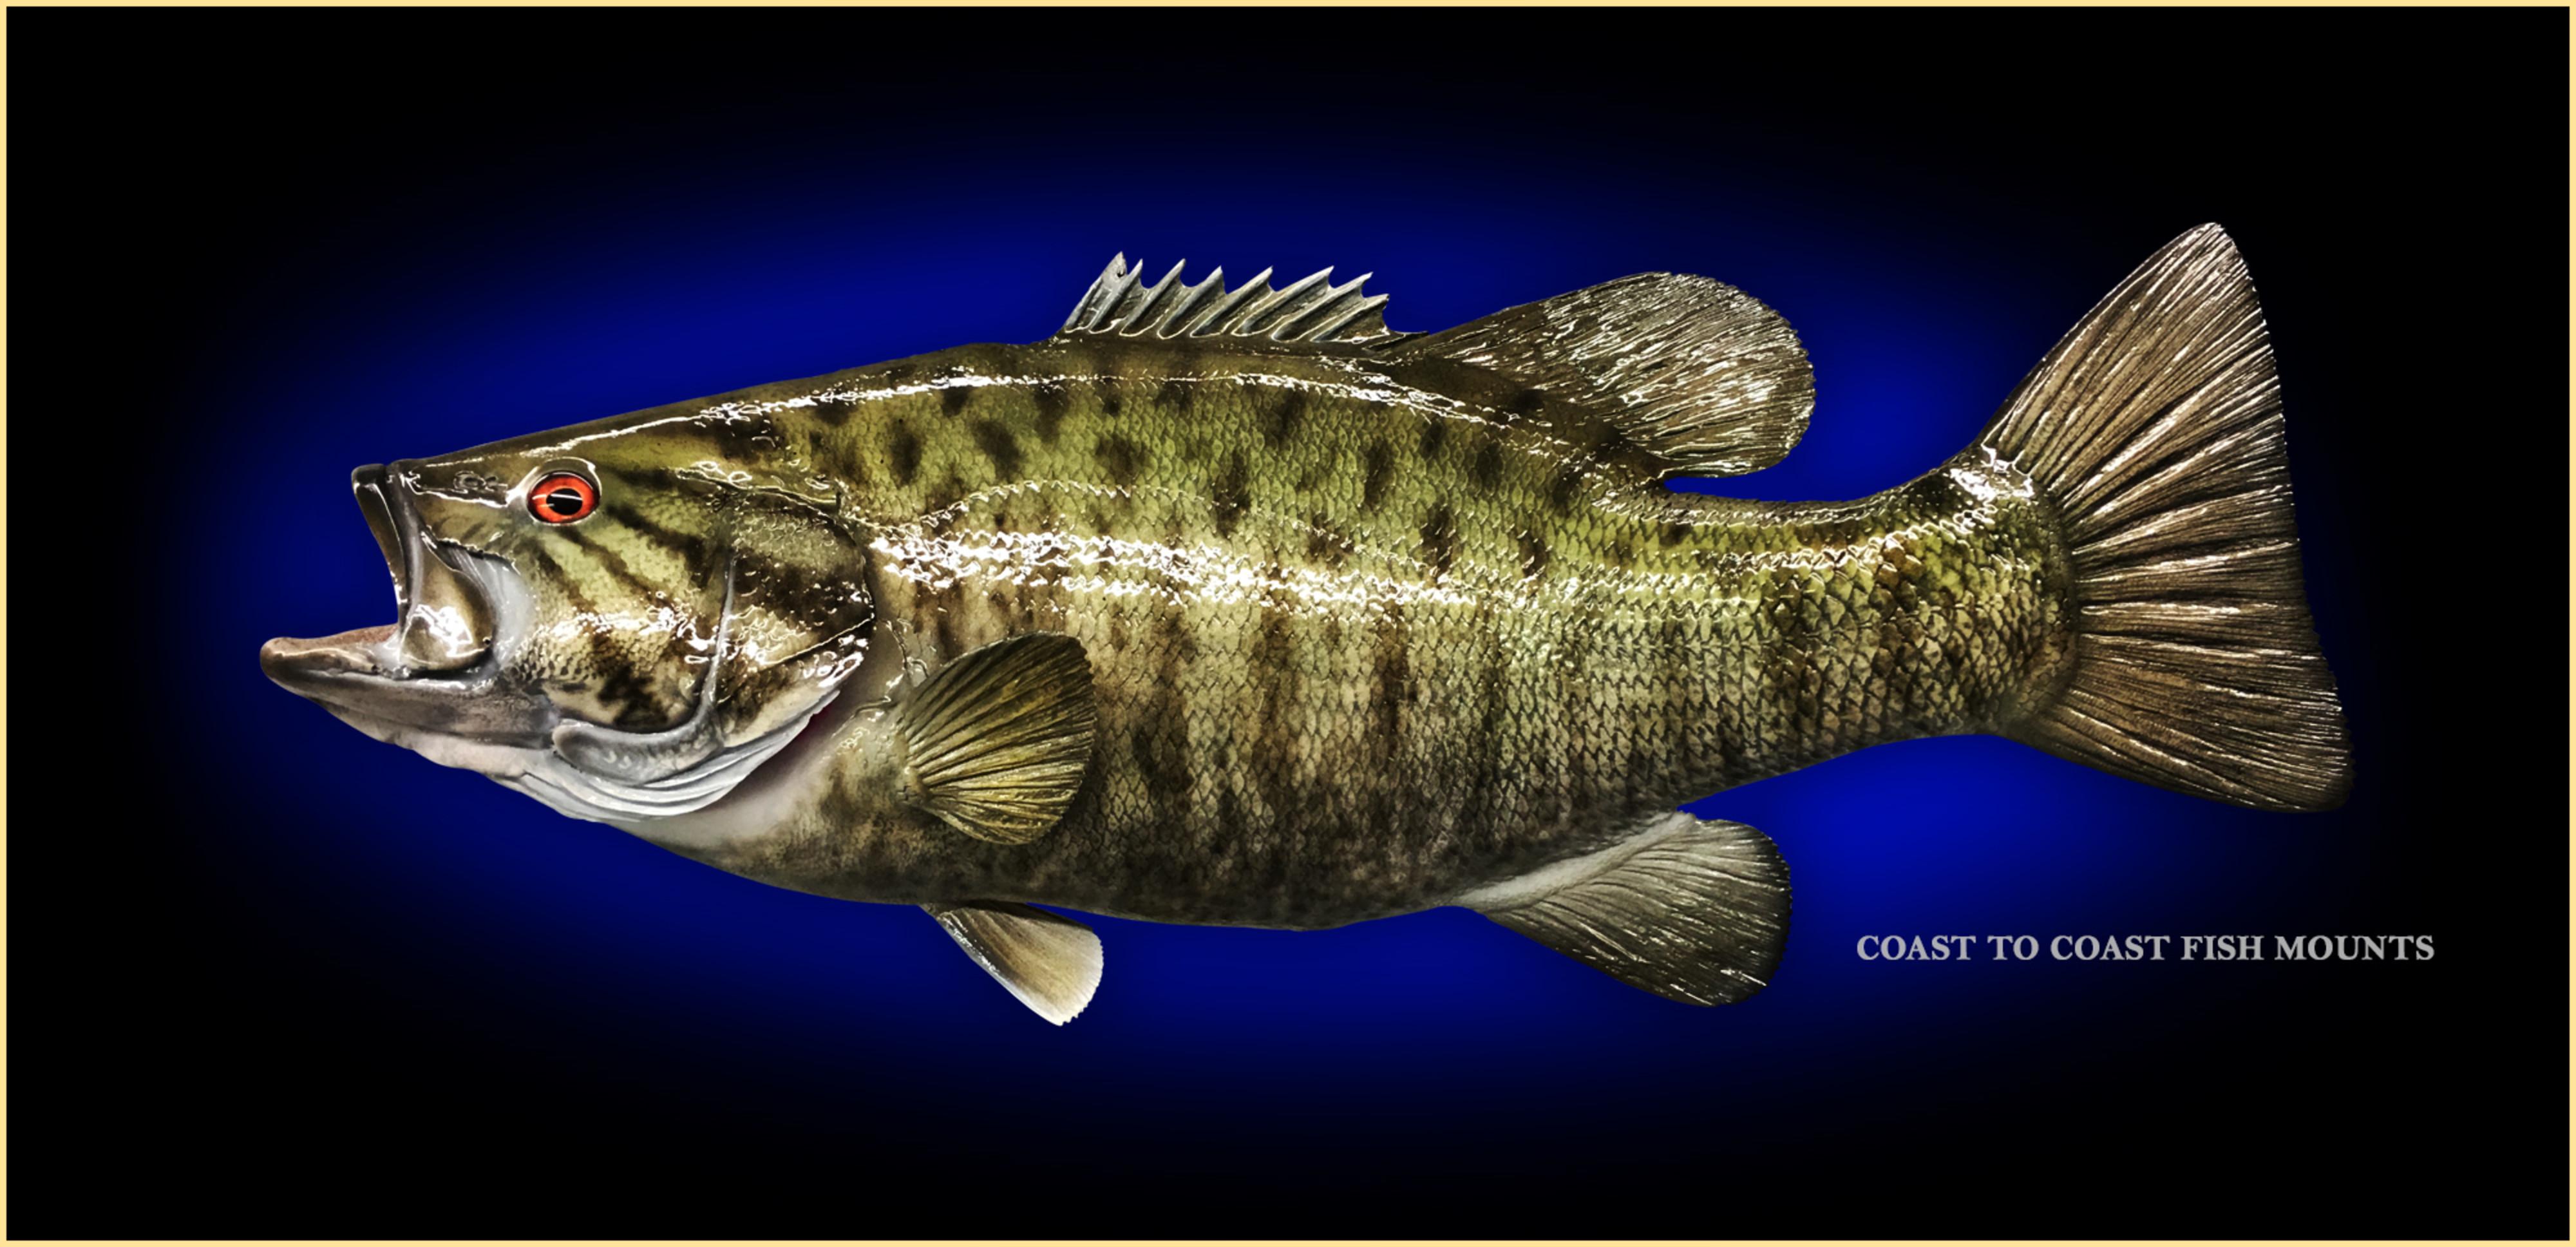 Smallmouth Bass Fish Mount and Fish Replicas | Coast-to-Coast